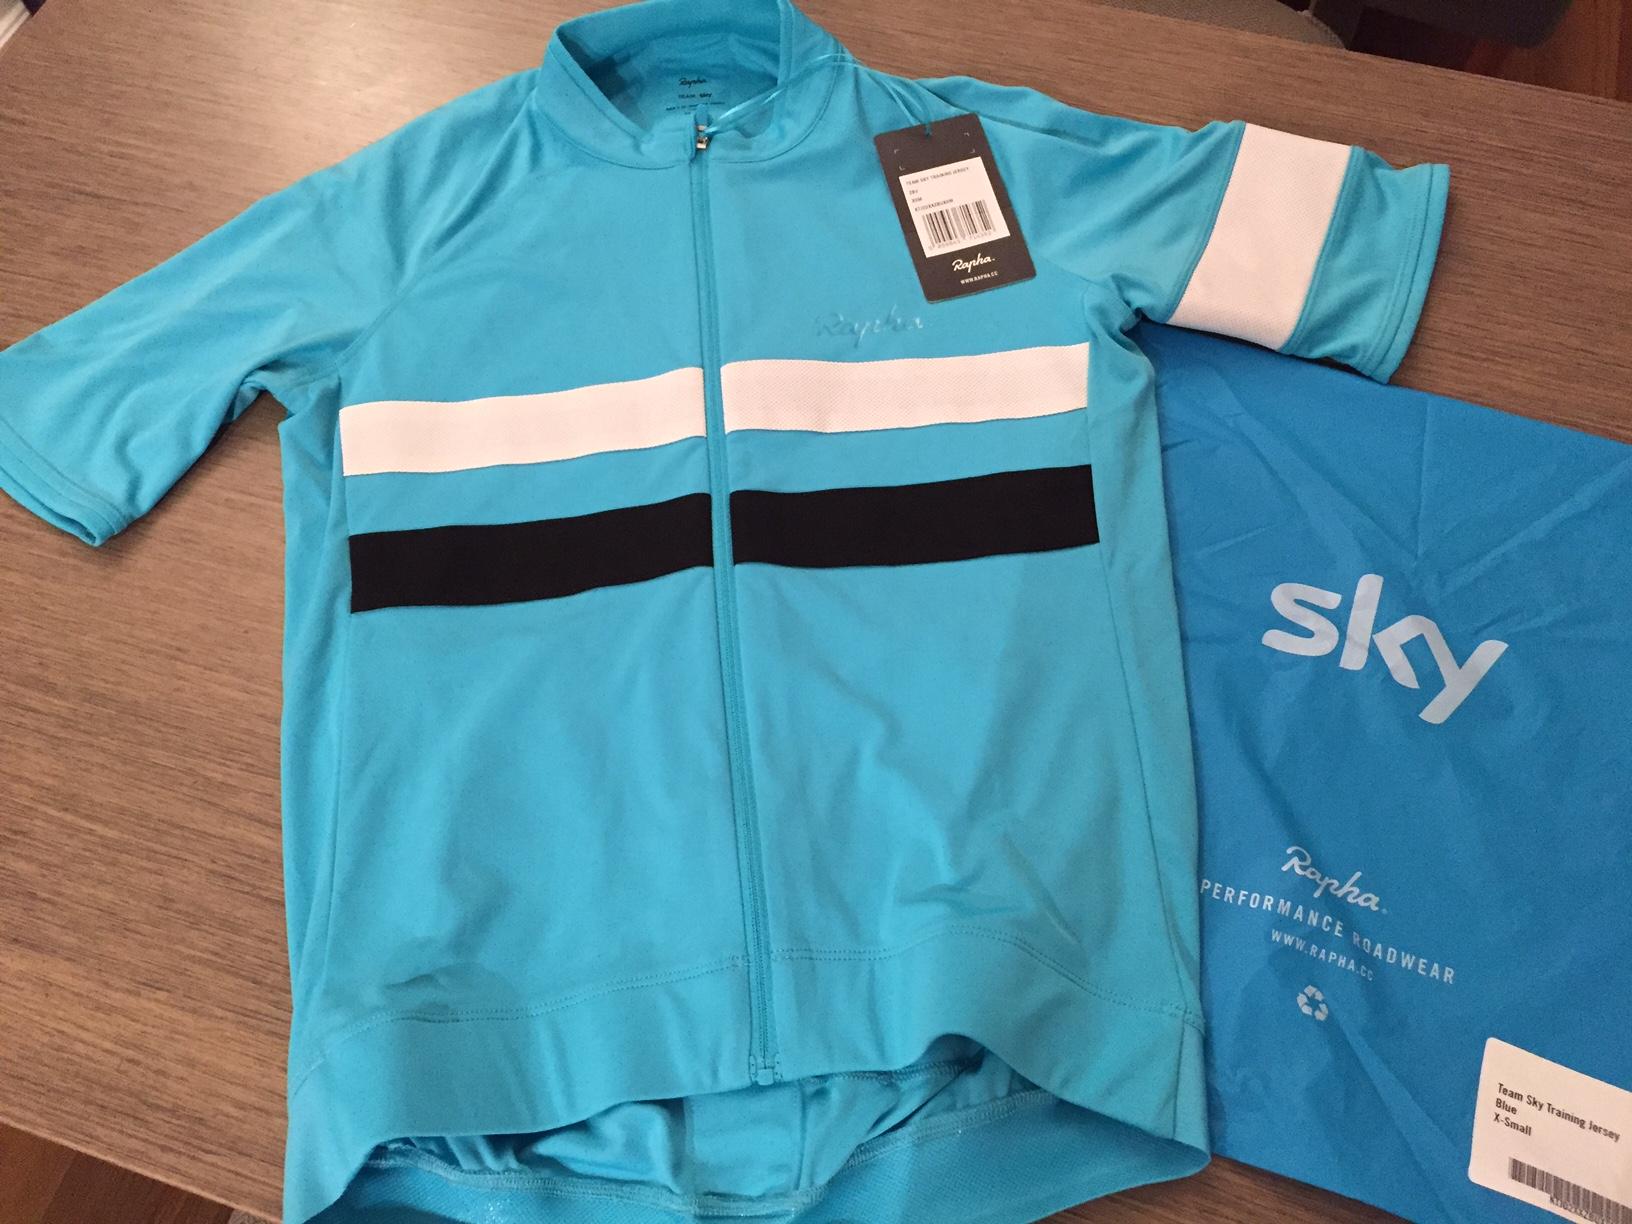 Rapha Team Sky Training Jersey と My Rapha Collection - まーちんのNY ... b8fab1363